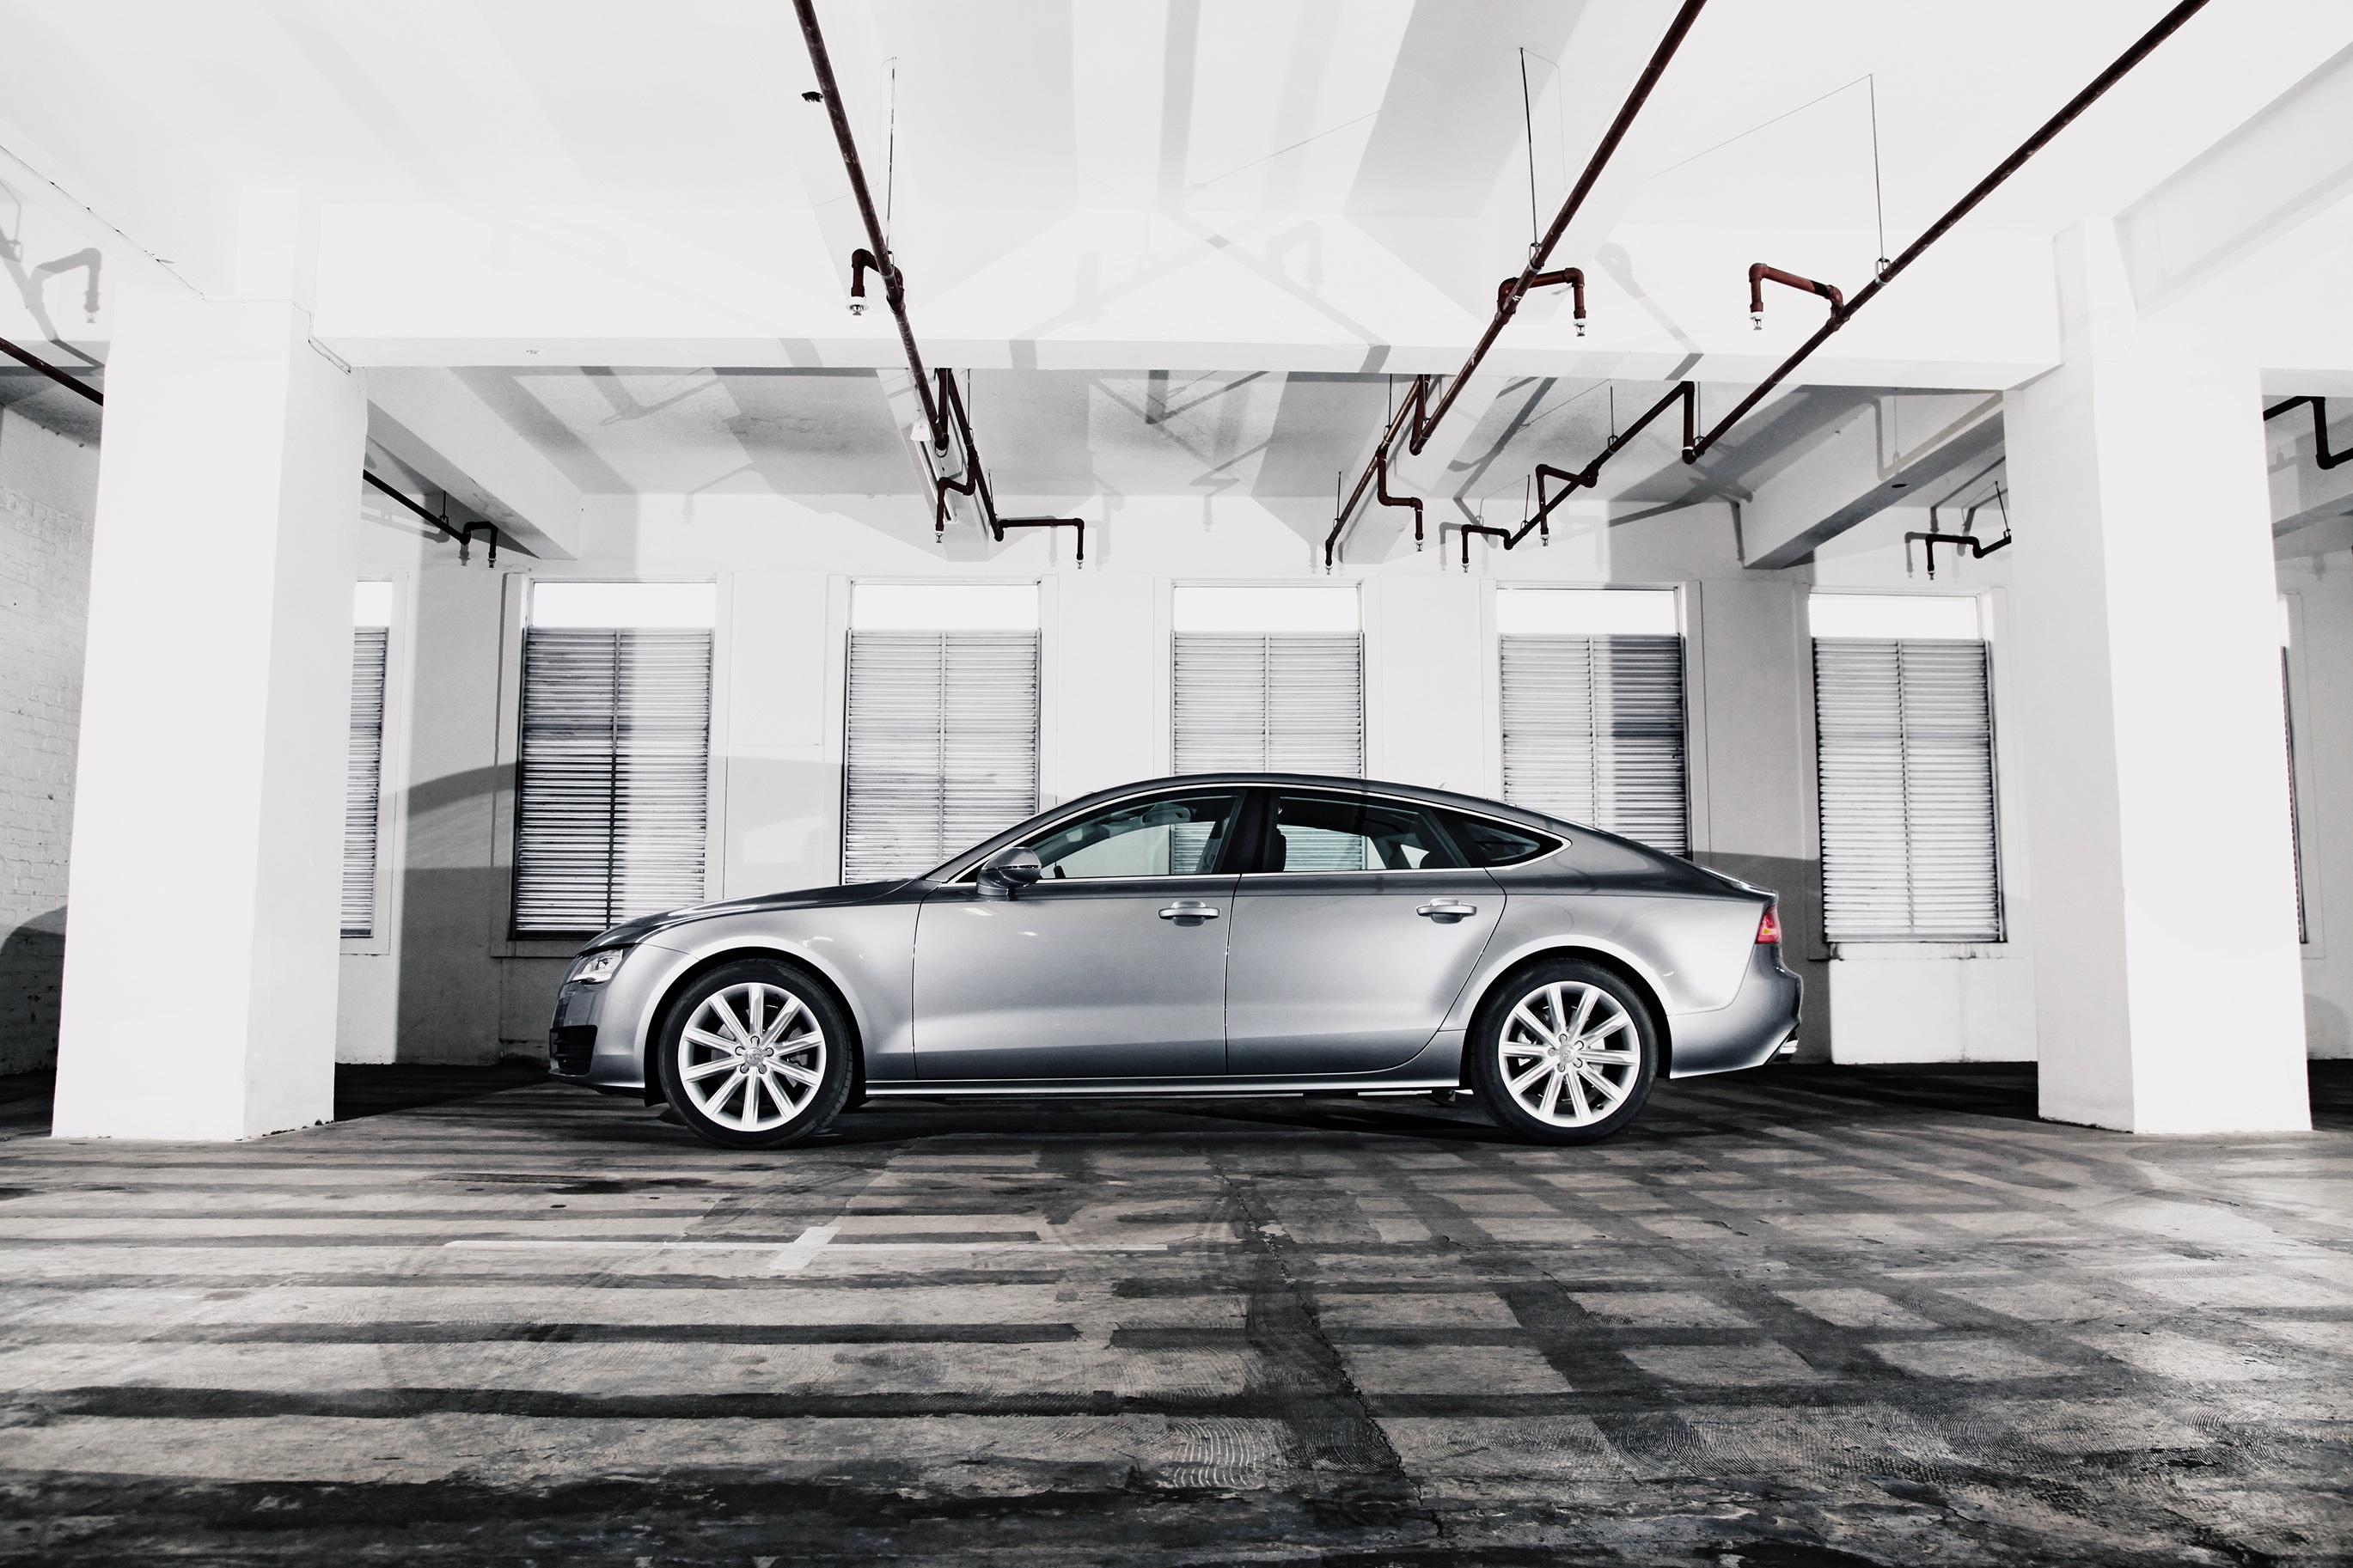 Free Images Wheel Underground Transport Monochrome Modern - Audi car lot